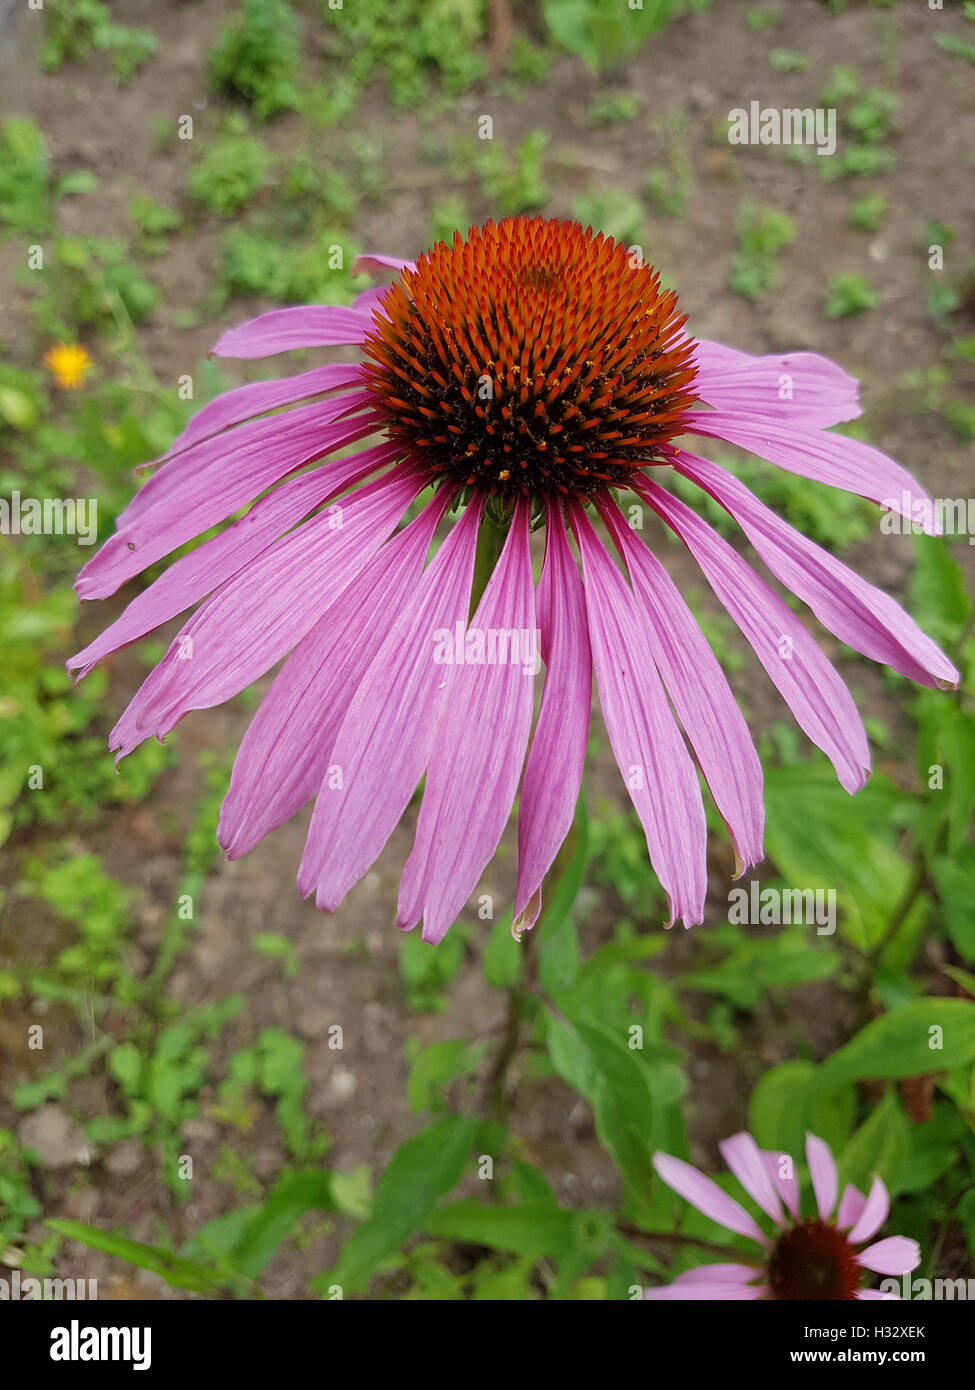 Roter Sonnenhut; Heilpflanze - Stock Image